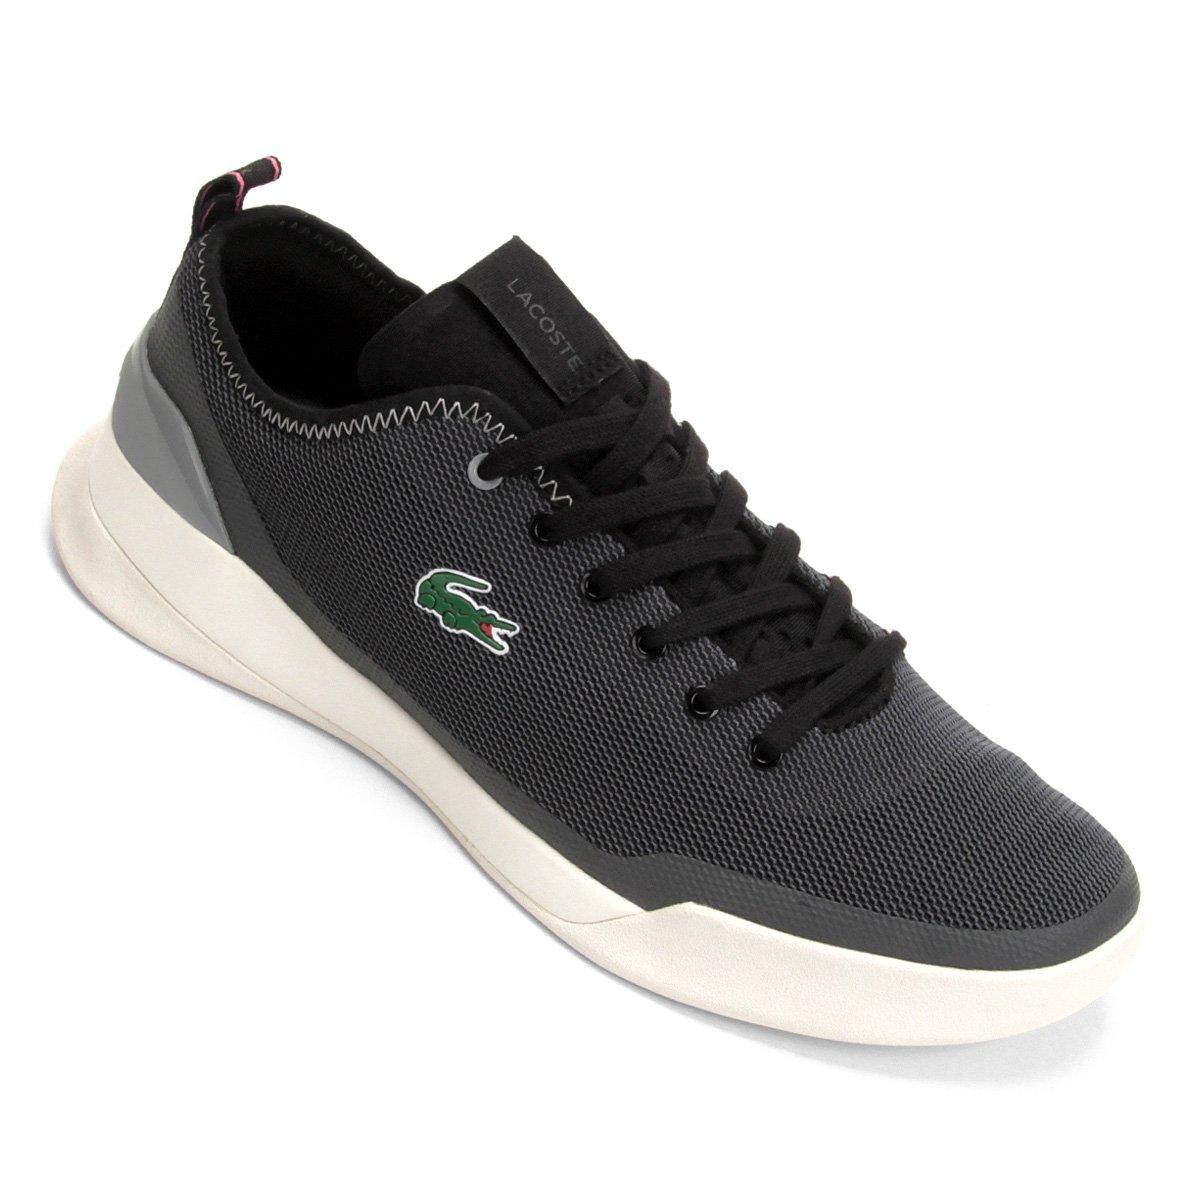 bf5ebf1d58b8f FornecedorNetshoes. Tênis Lacoste Dual Masculino